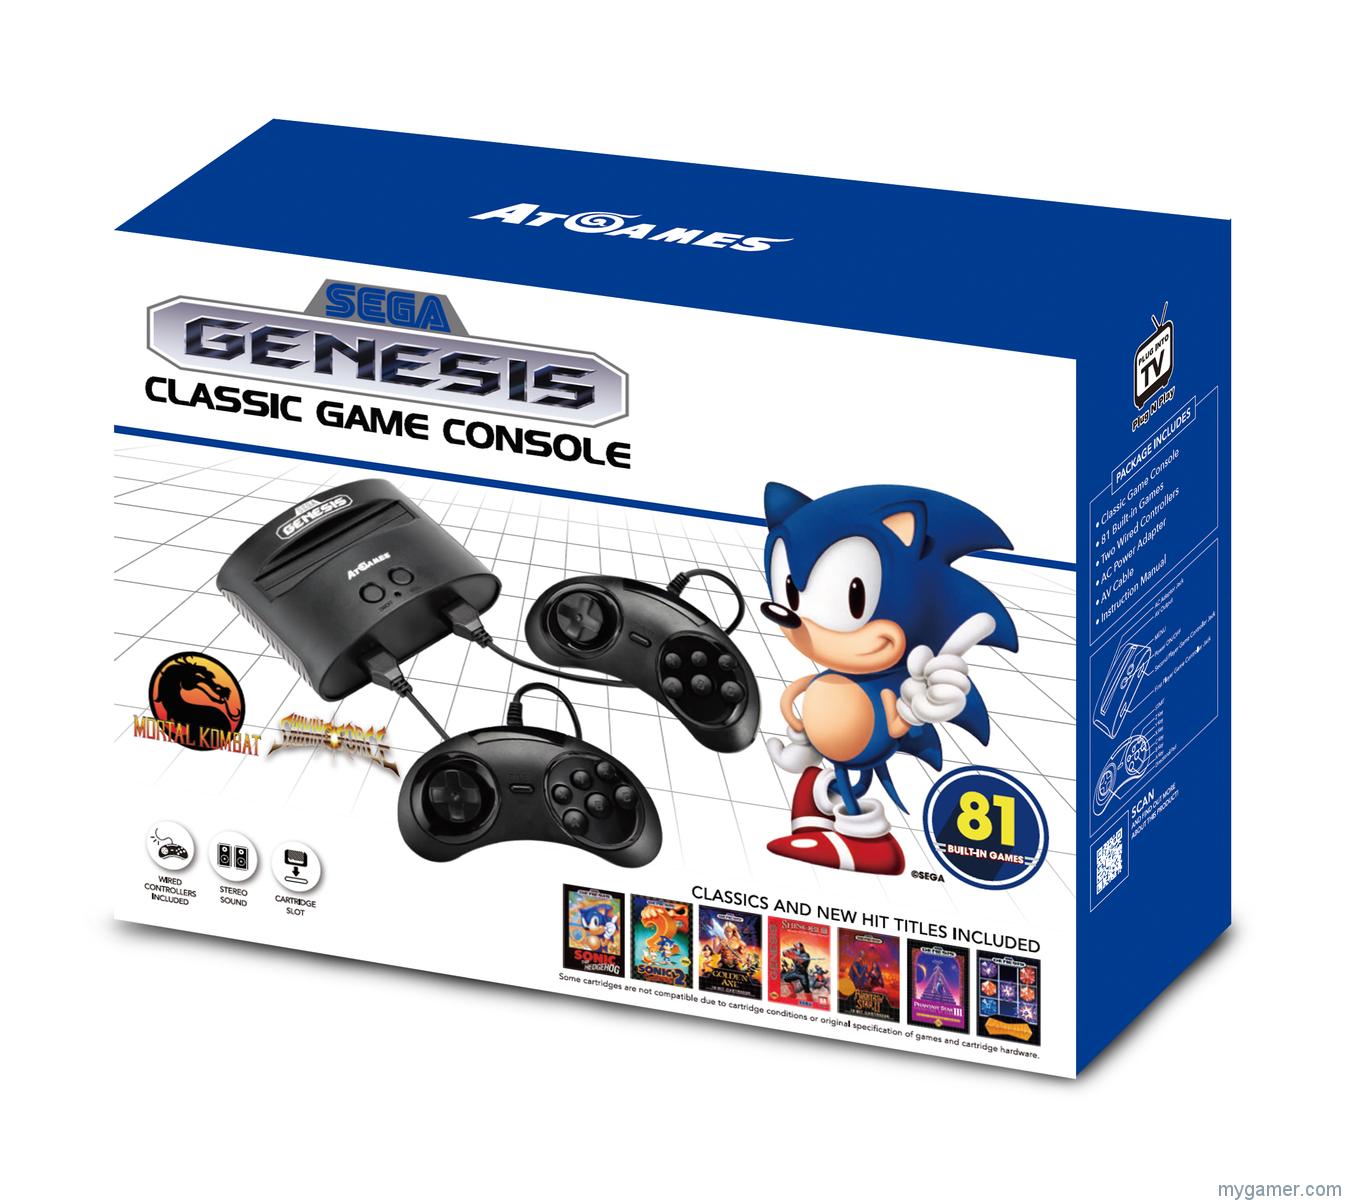 [object object] Launch Dates Announced for New Atari 2600/Sega Genesis Consoles and Handhelds Sega Genesis Flashback 8